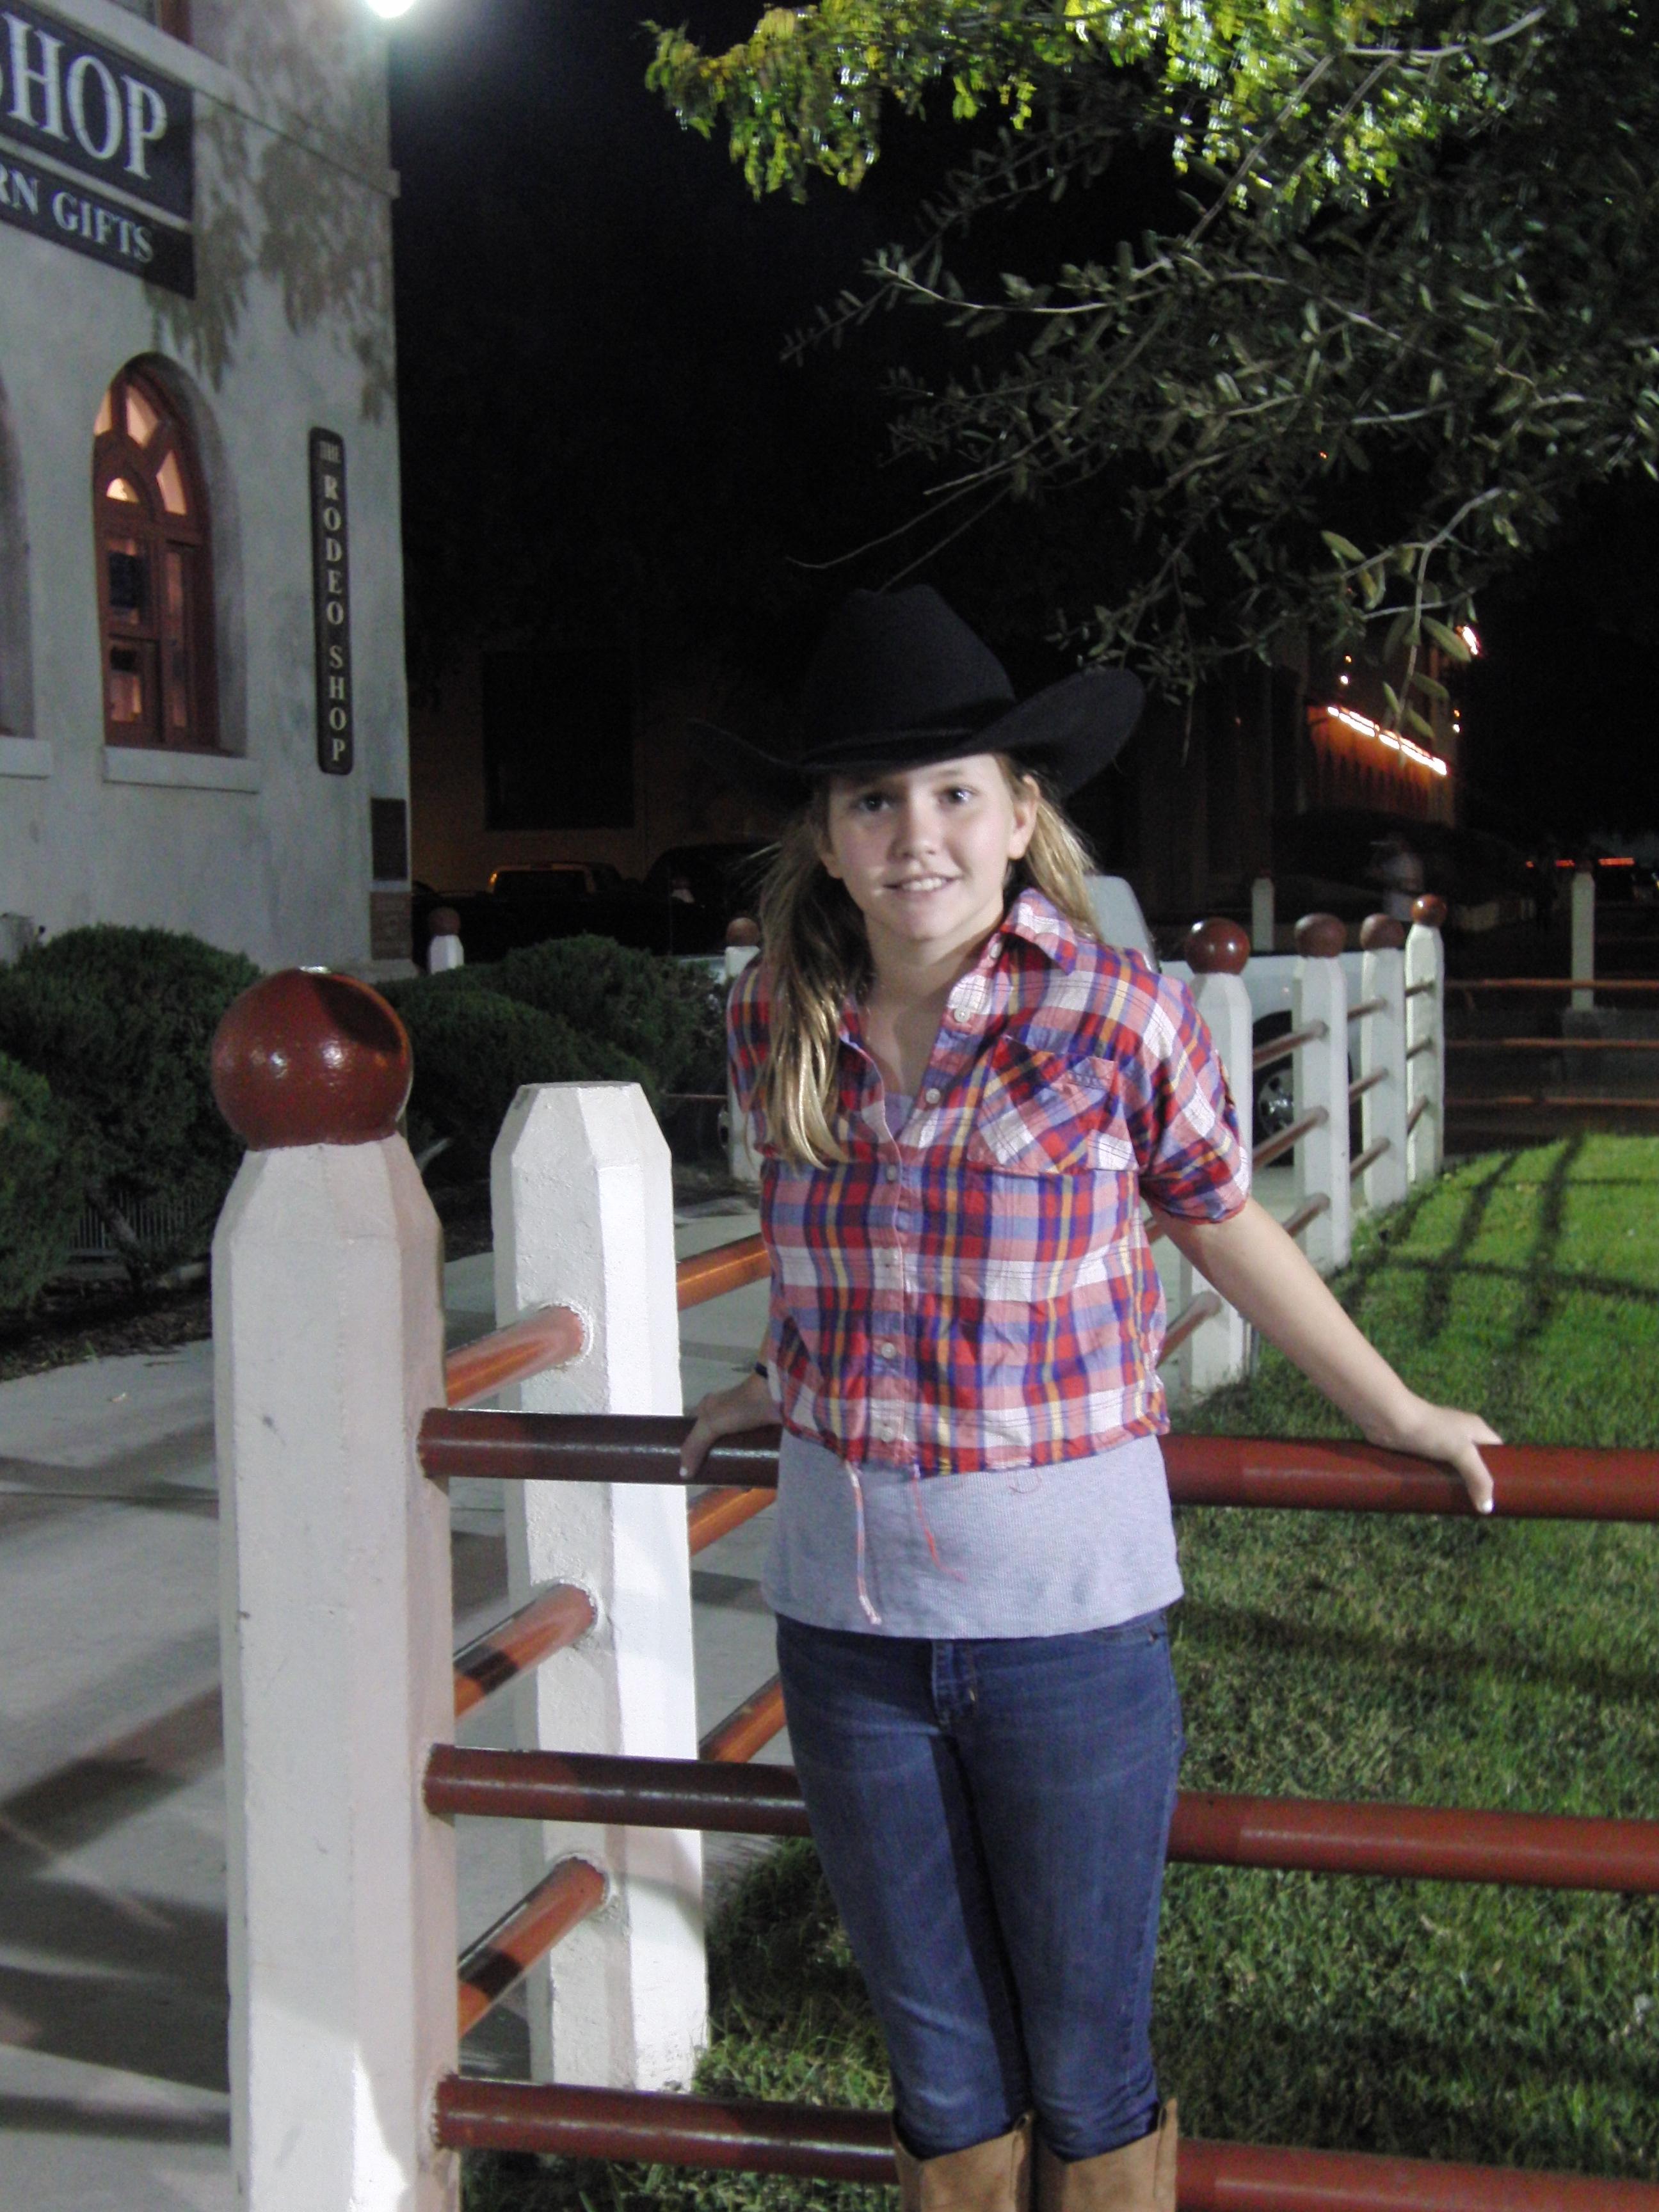 Stockyards Championship Rodeo Having Fun In The Texas Sun